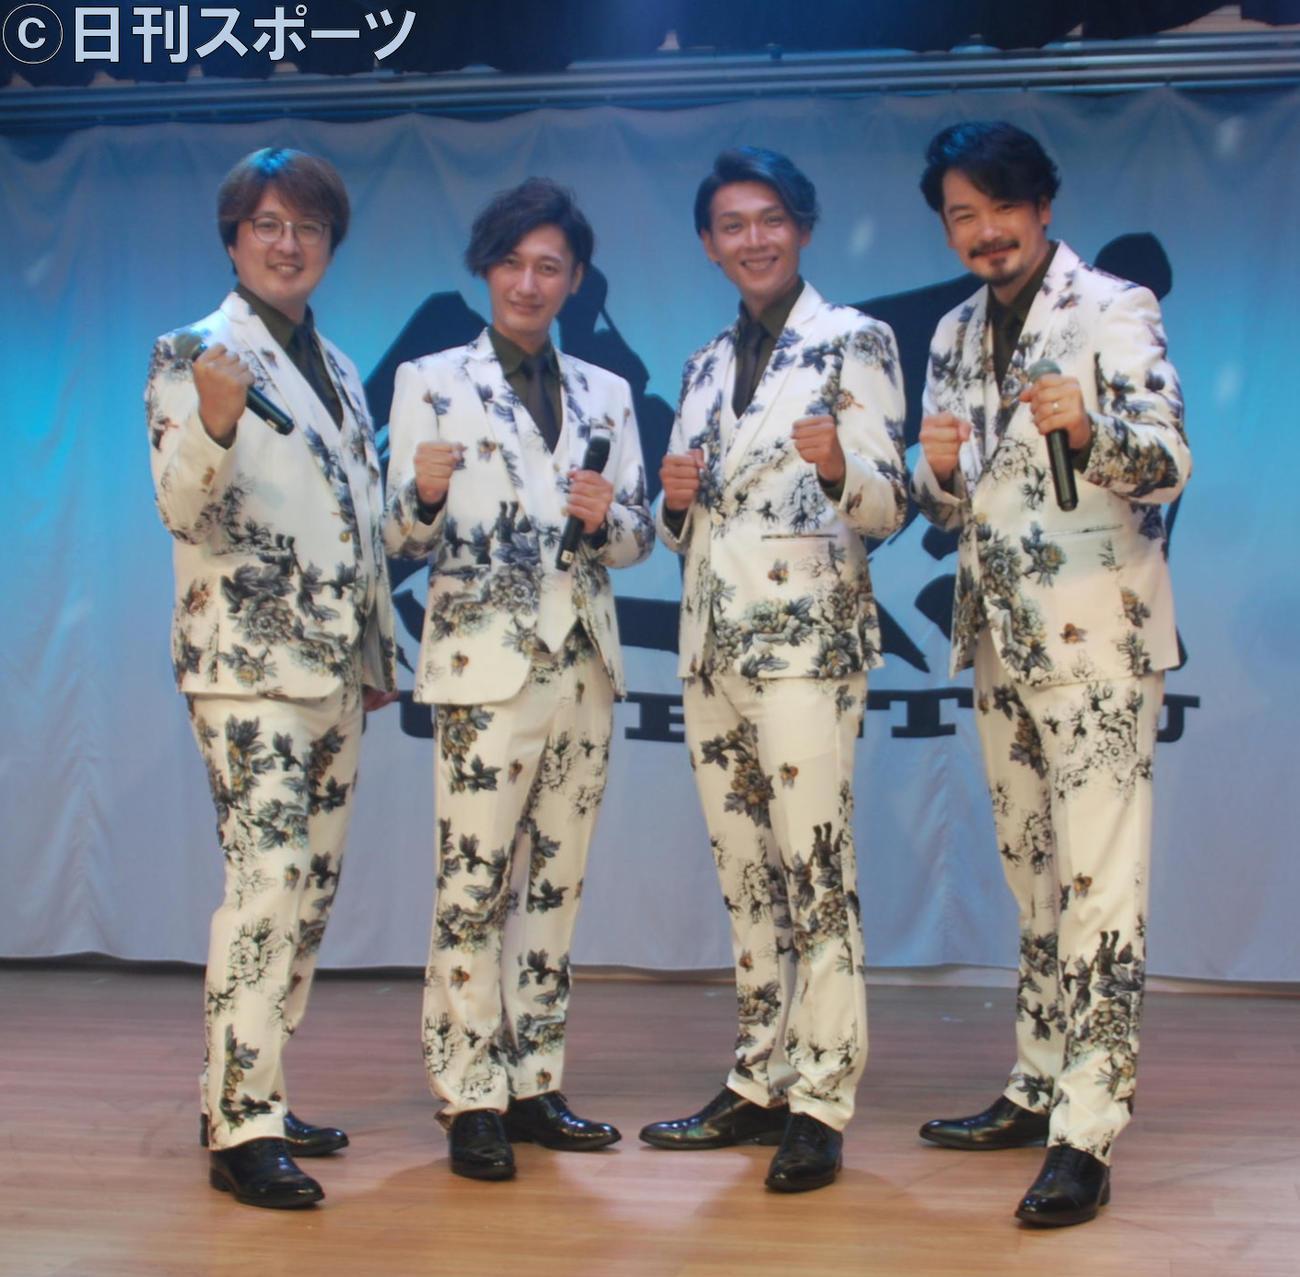 「純烈」の左から酒井一圭、後上翔太、白川裕二郎、小田井涼平(撮影・松浦隆司)